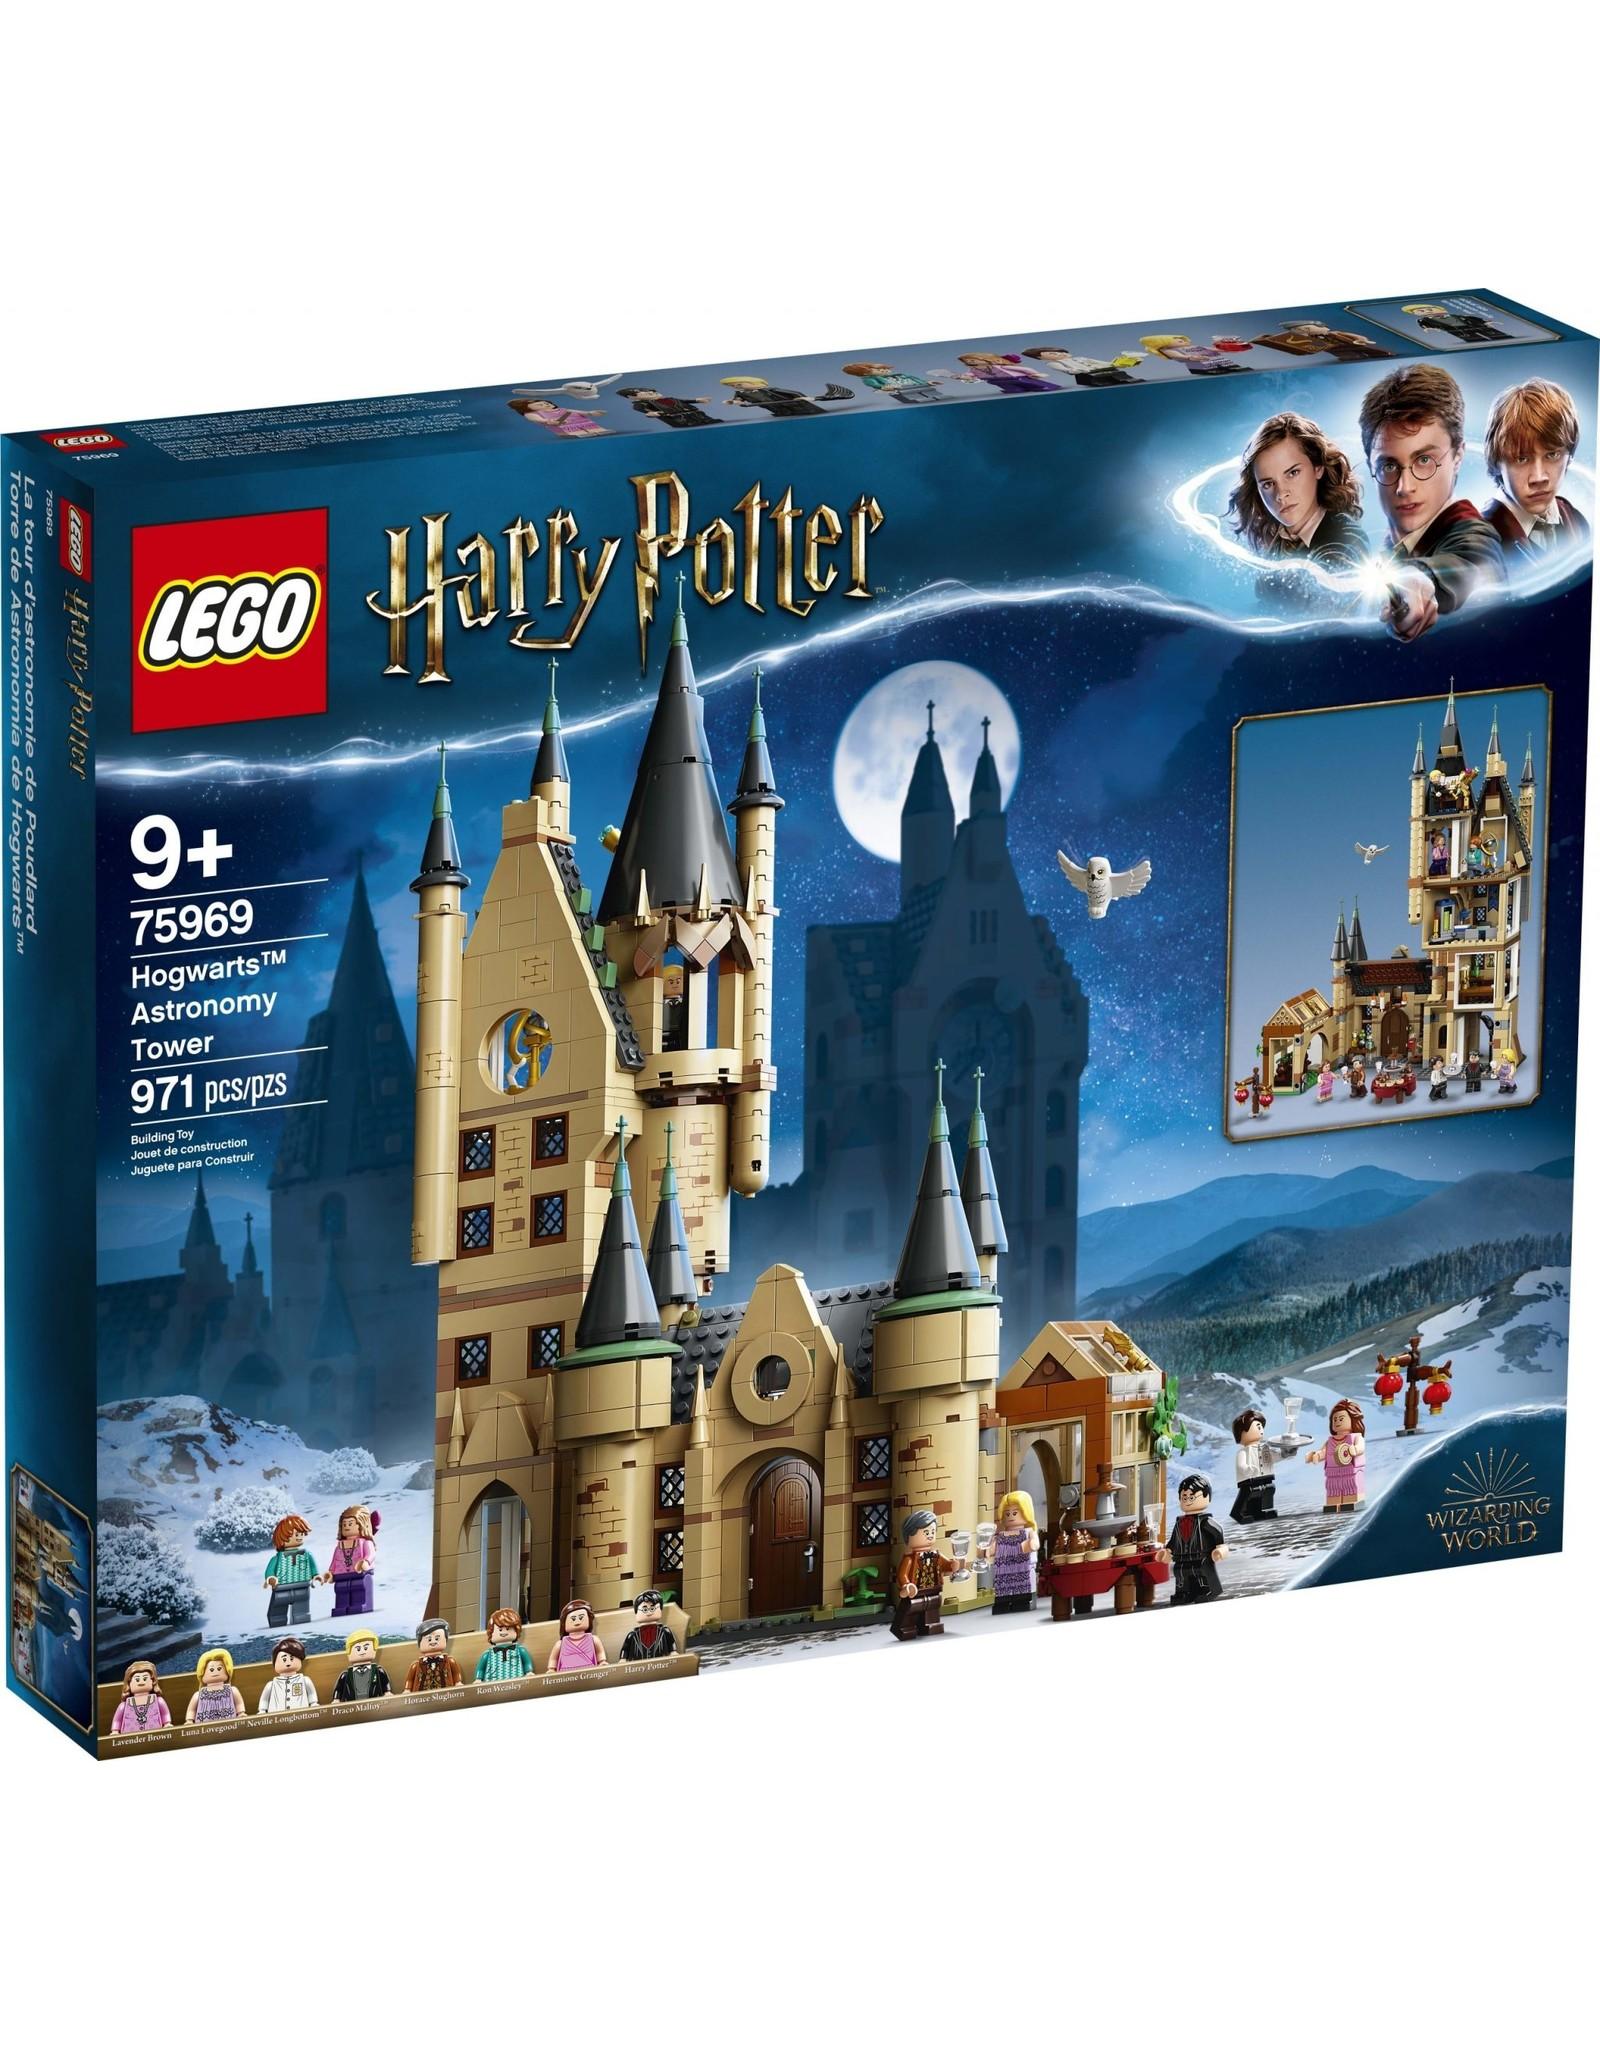 Lego Hogwarts Astronomy Tower